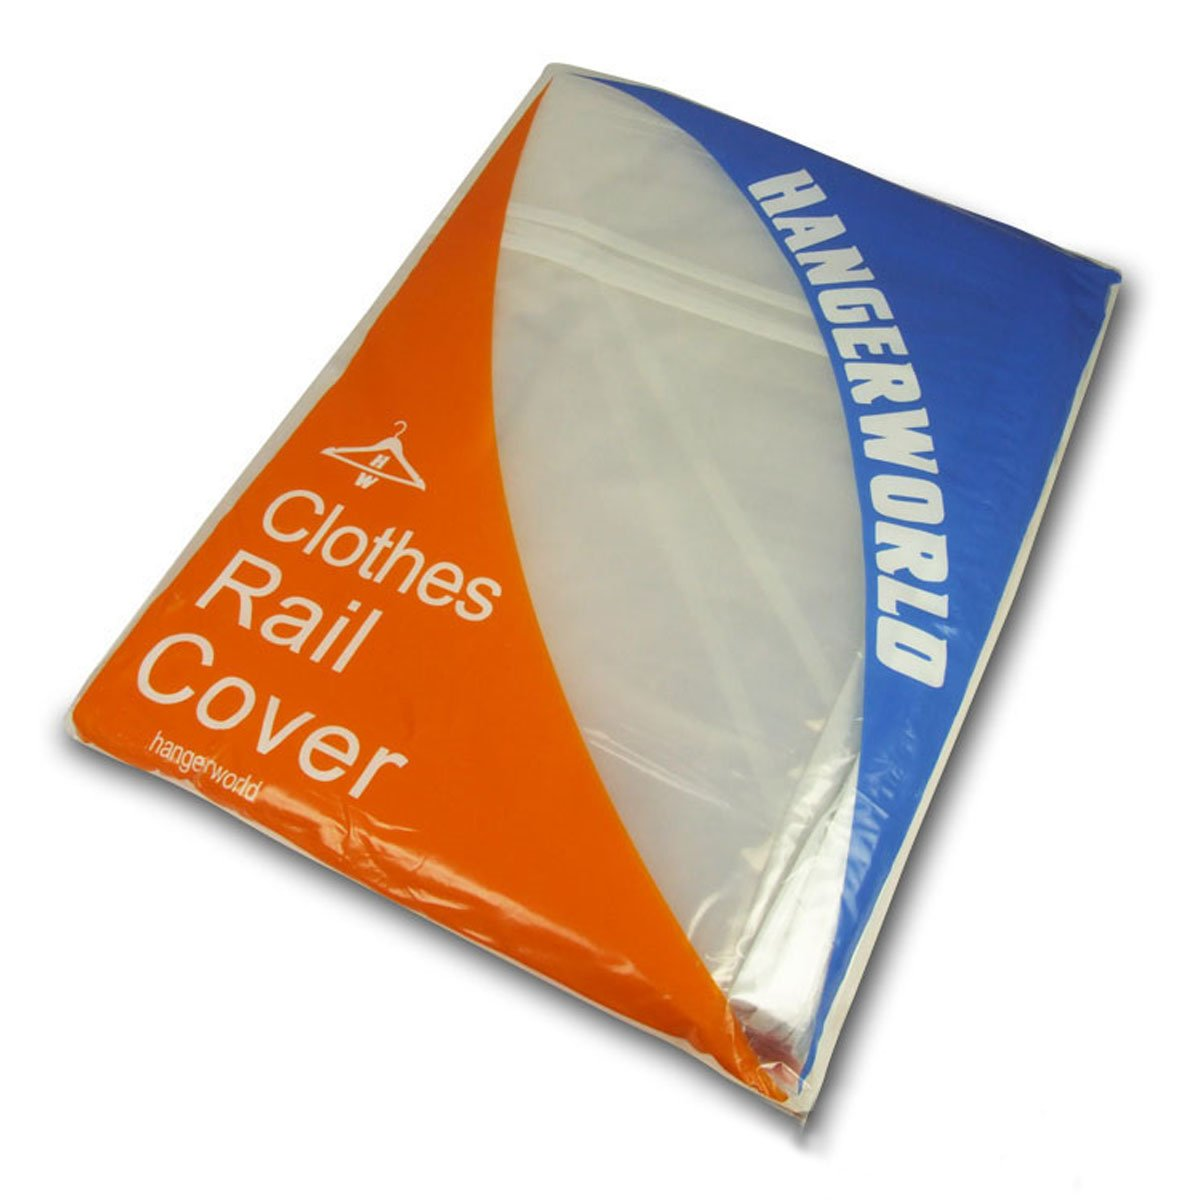 Hangerworld 6 ft Transparent Clothes Rail Cover Garment Coat Hanger Protector Storage